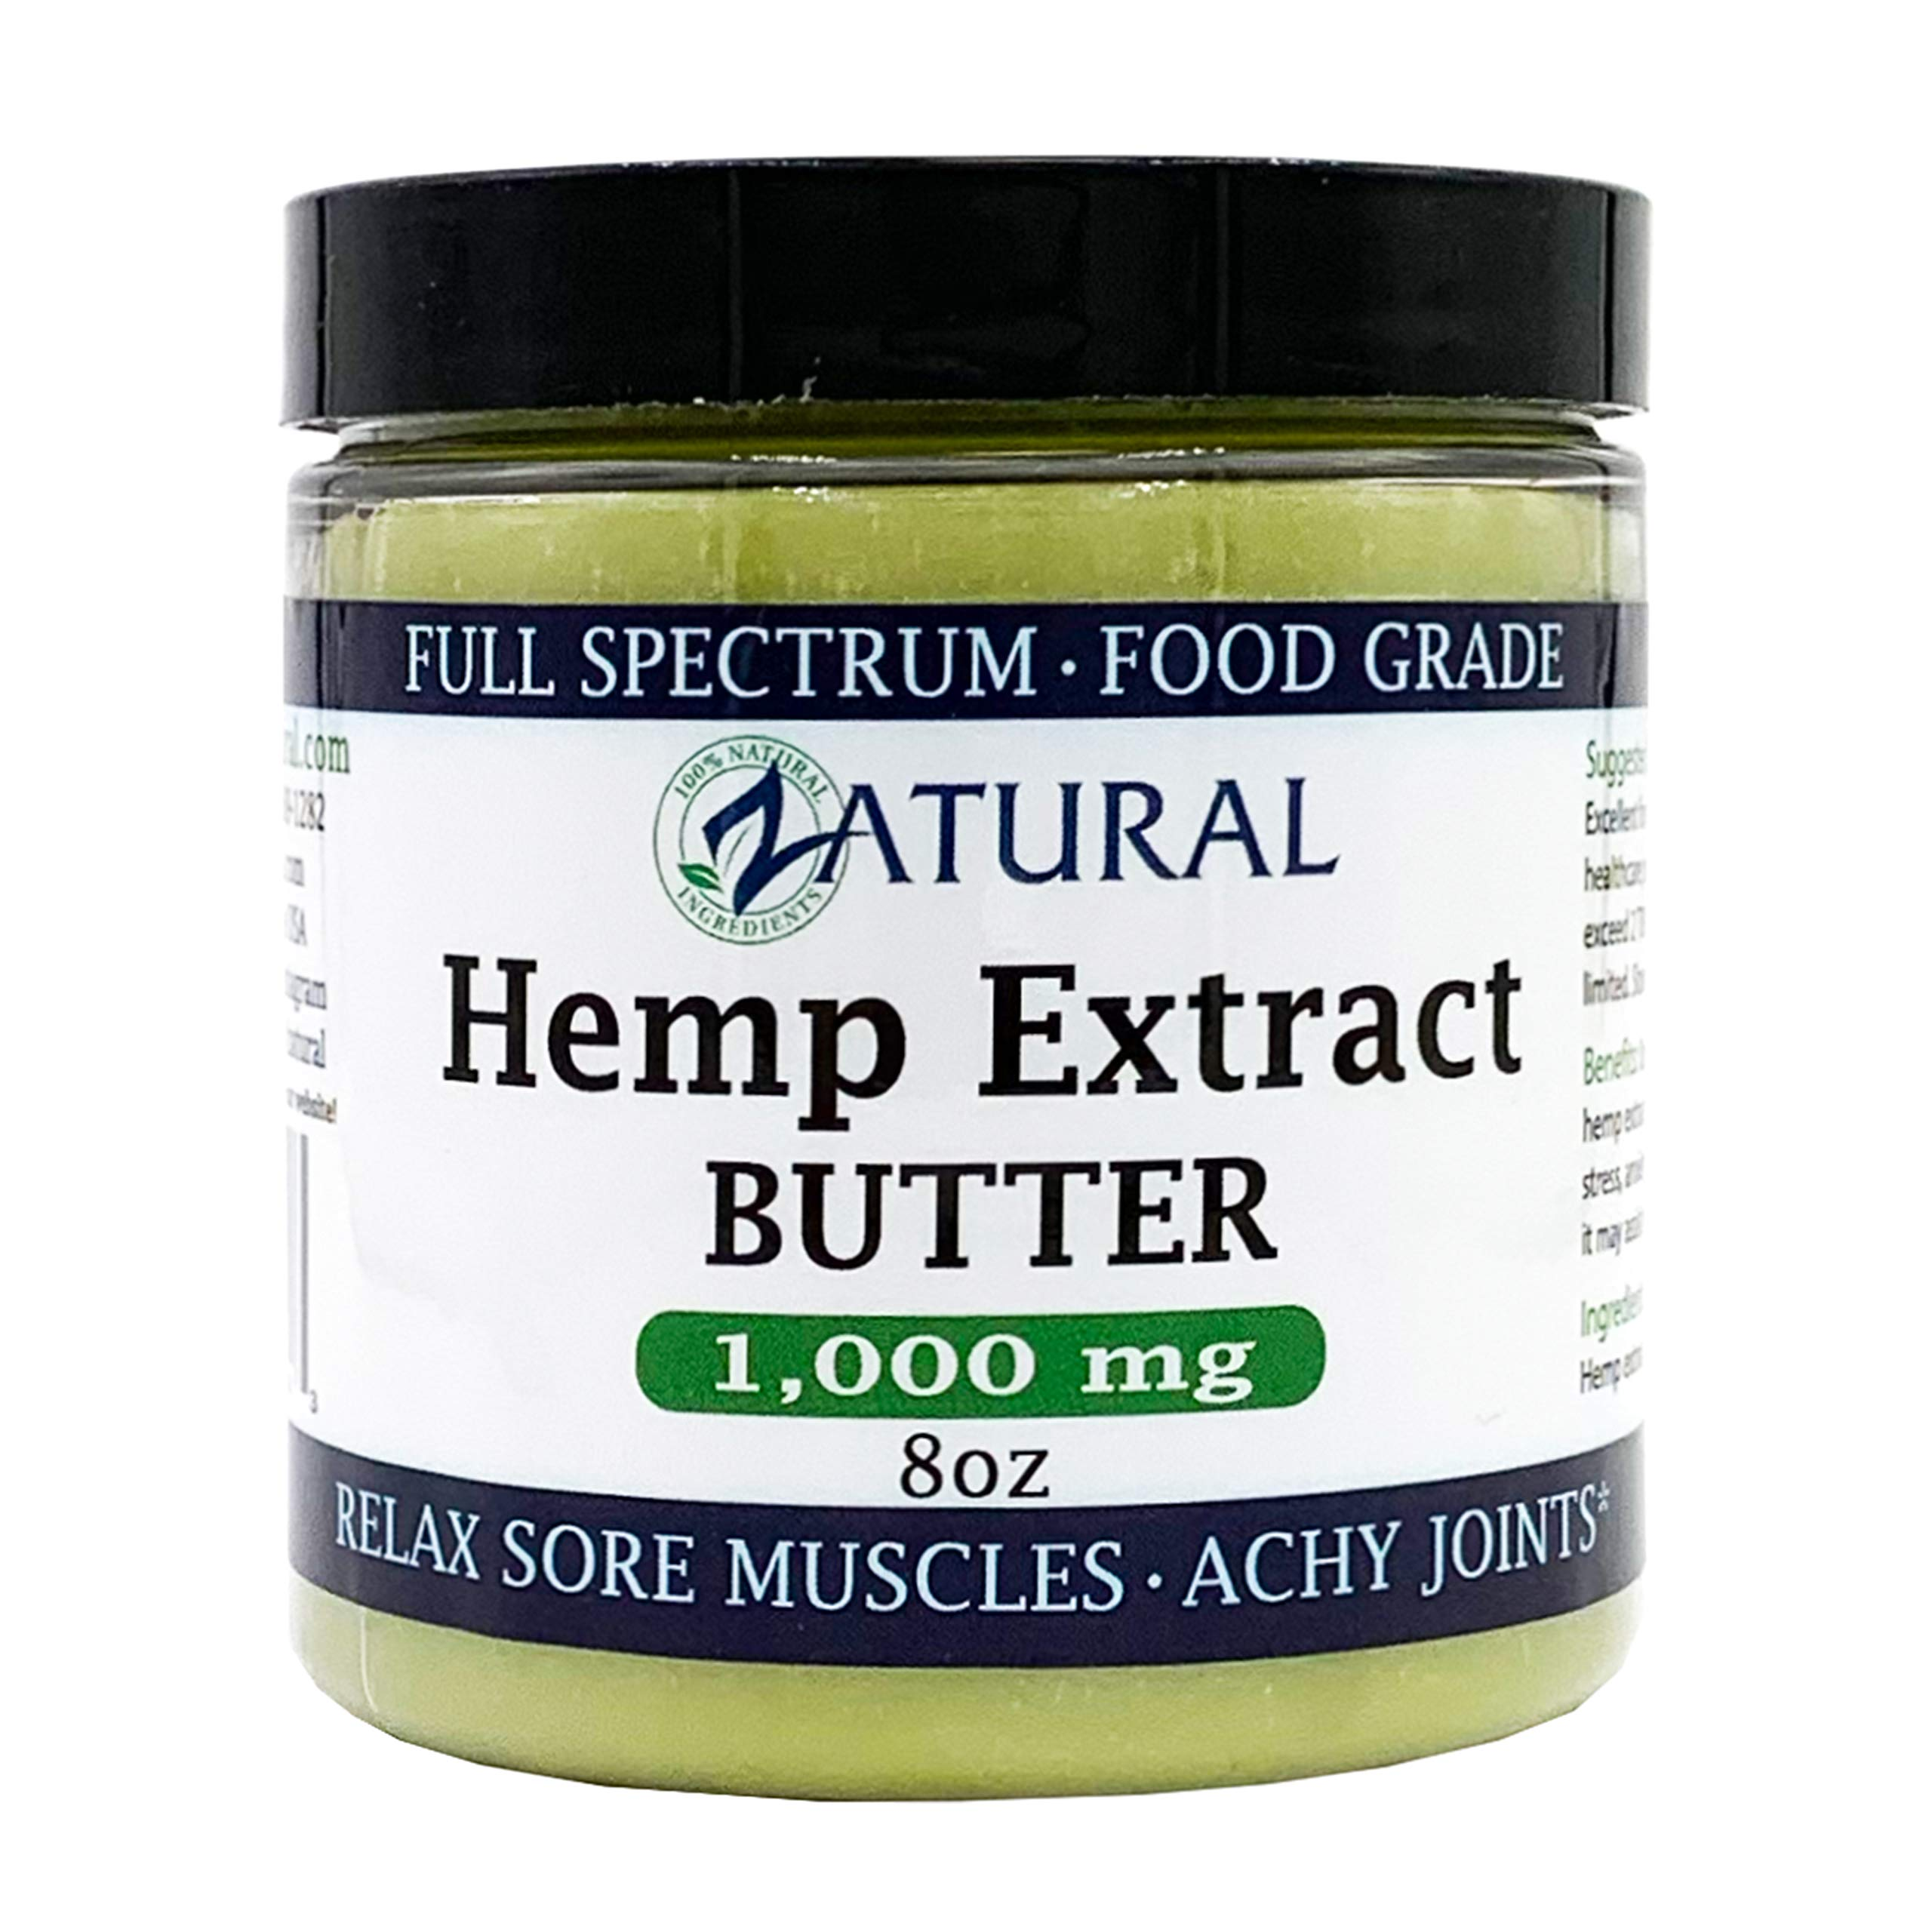 HEMP Extract BUTTER | 100% pure |organic | raw | handcrafted | vegan (Hemp Extract 1,000mg 8oz)